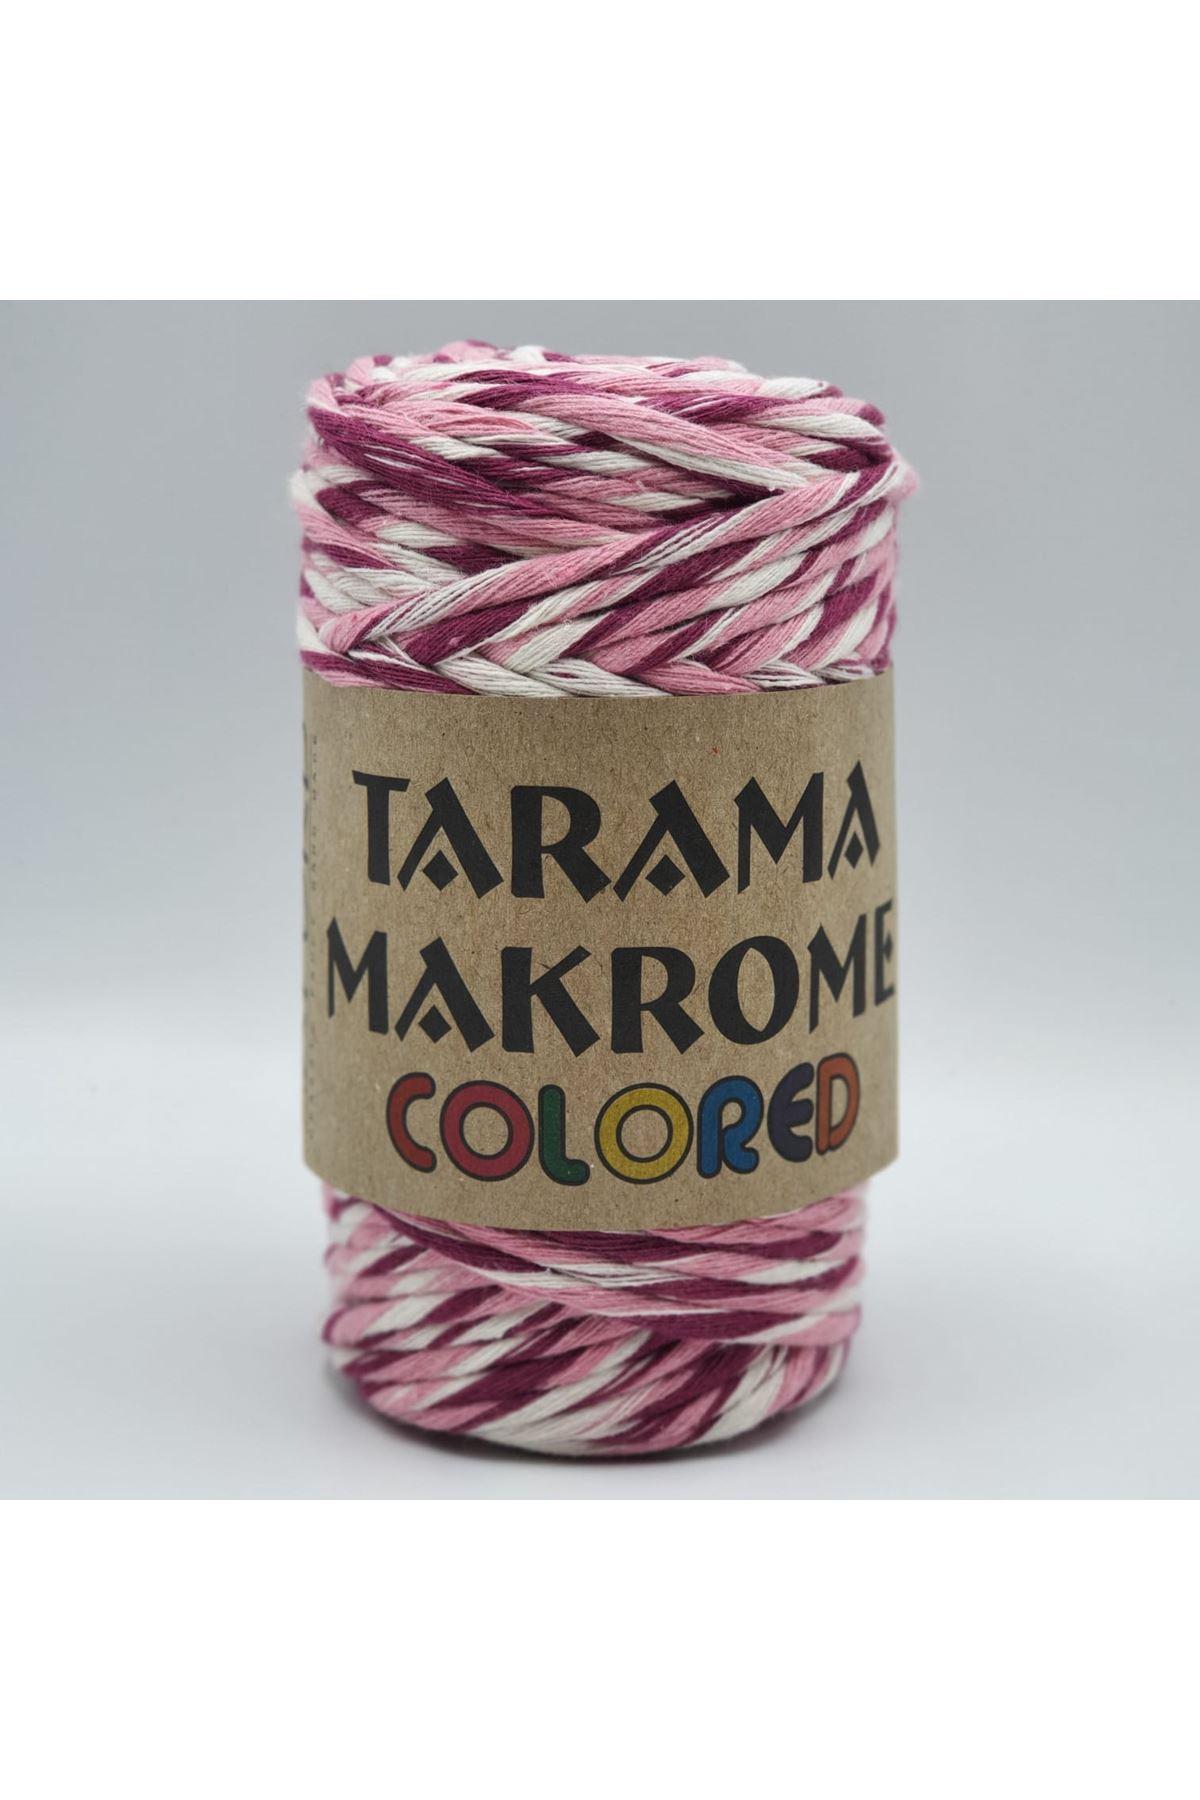 Tarama Makrome Colored 5 mm - 01